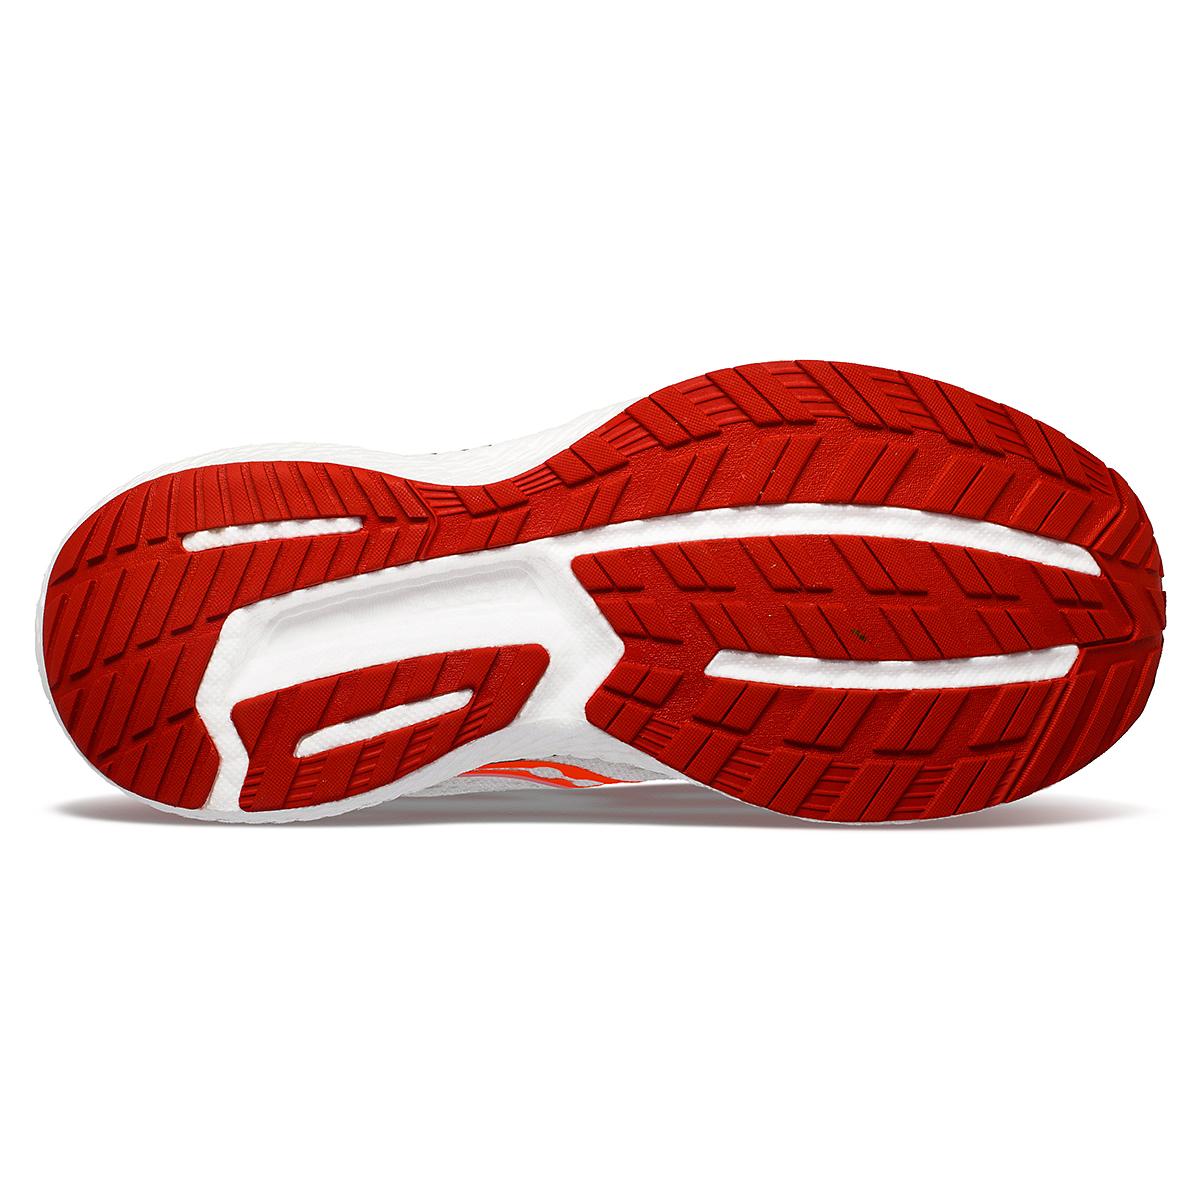 Women's Saucony Triumph 19 Running Shoe - Color: Jackalope - Size: 5 - Width: Regular, Jackalope, large, image 4